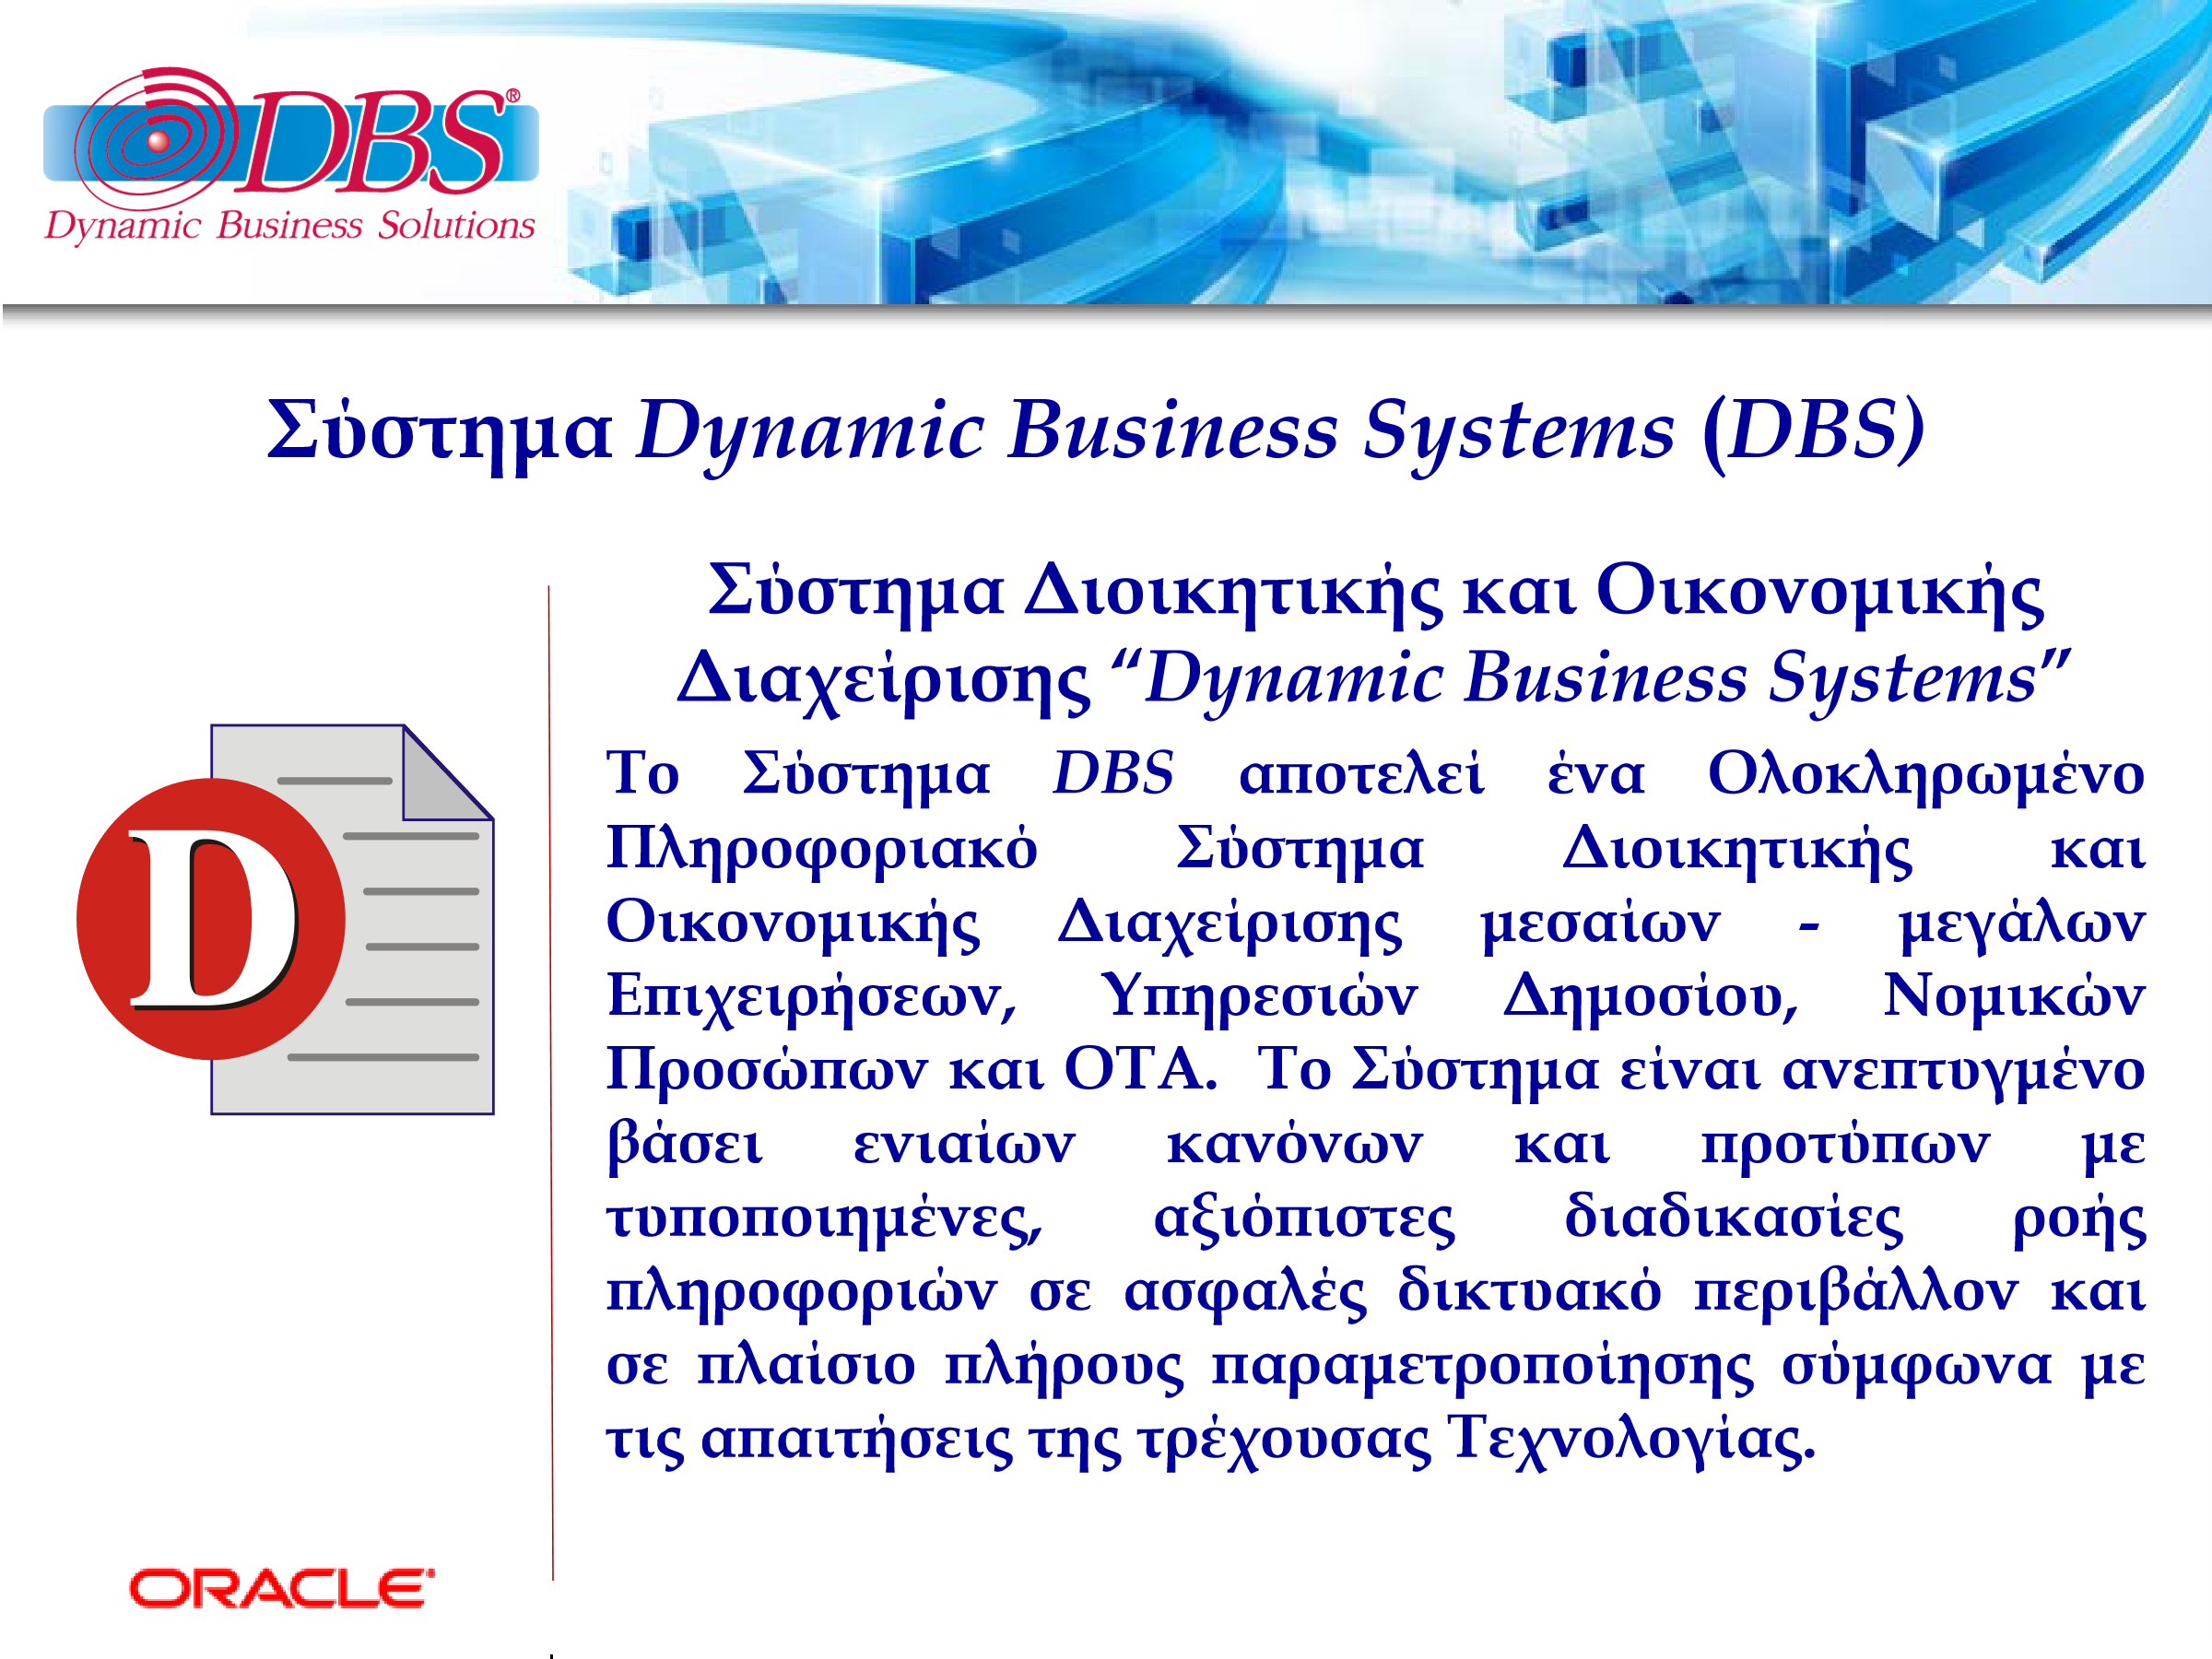 DBSDEMO2019_COMPANY_PROFILE_V18_R26FB-EL-15